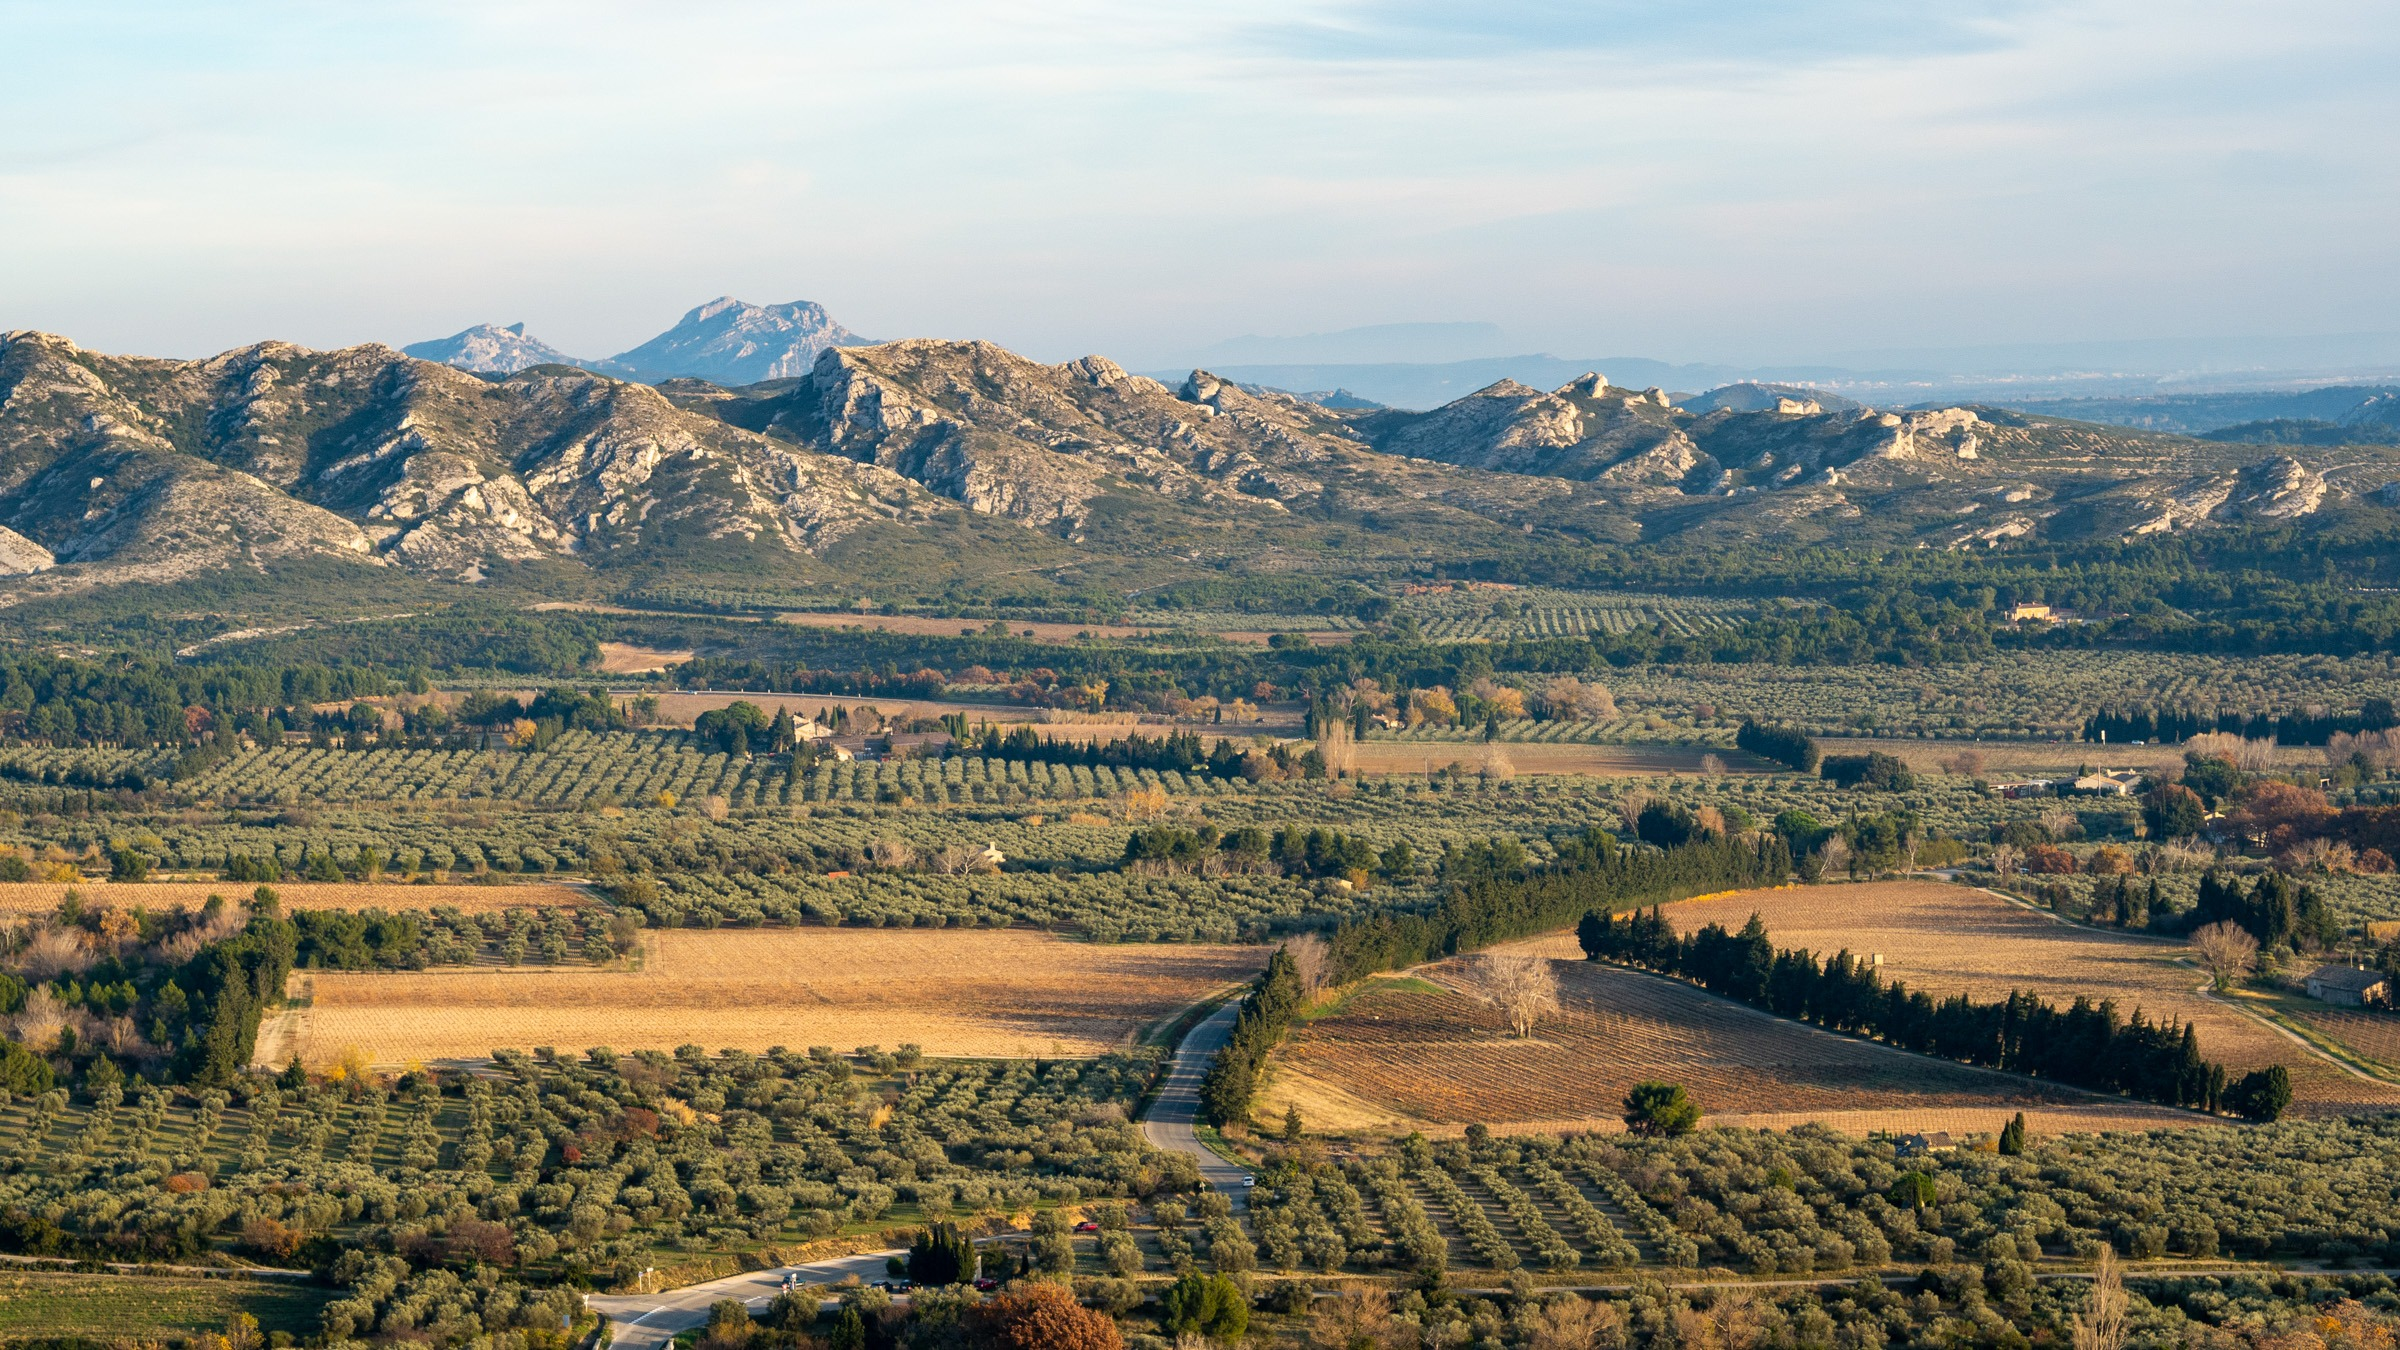 alpilles panorama from Baux-de-Provence